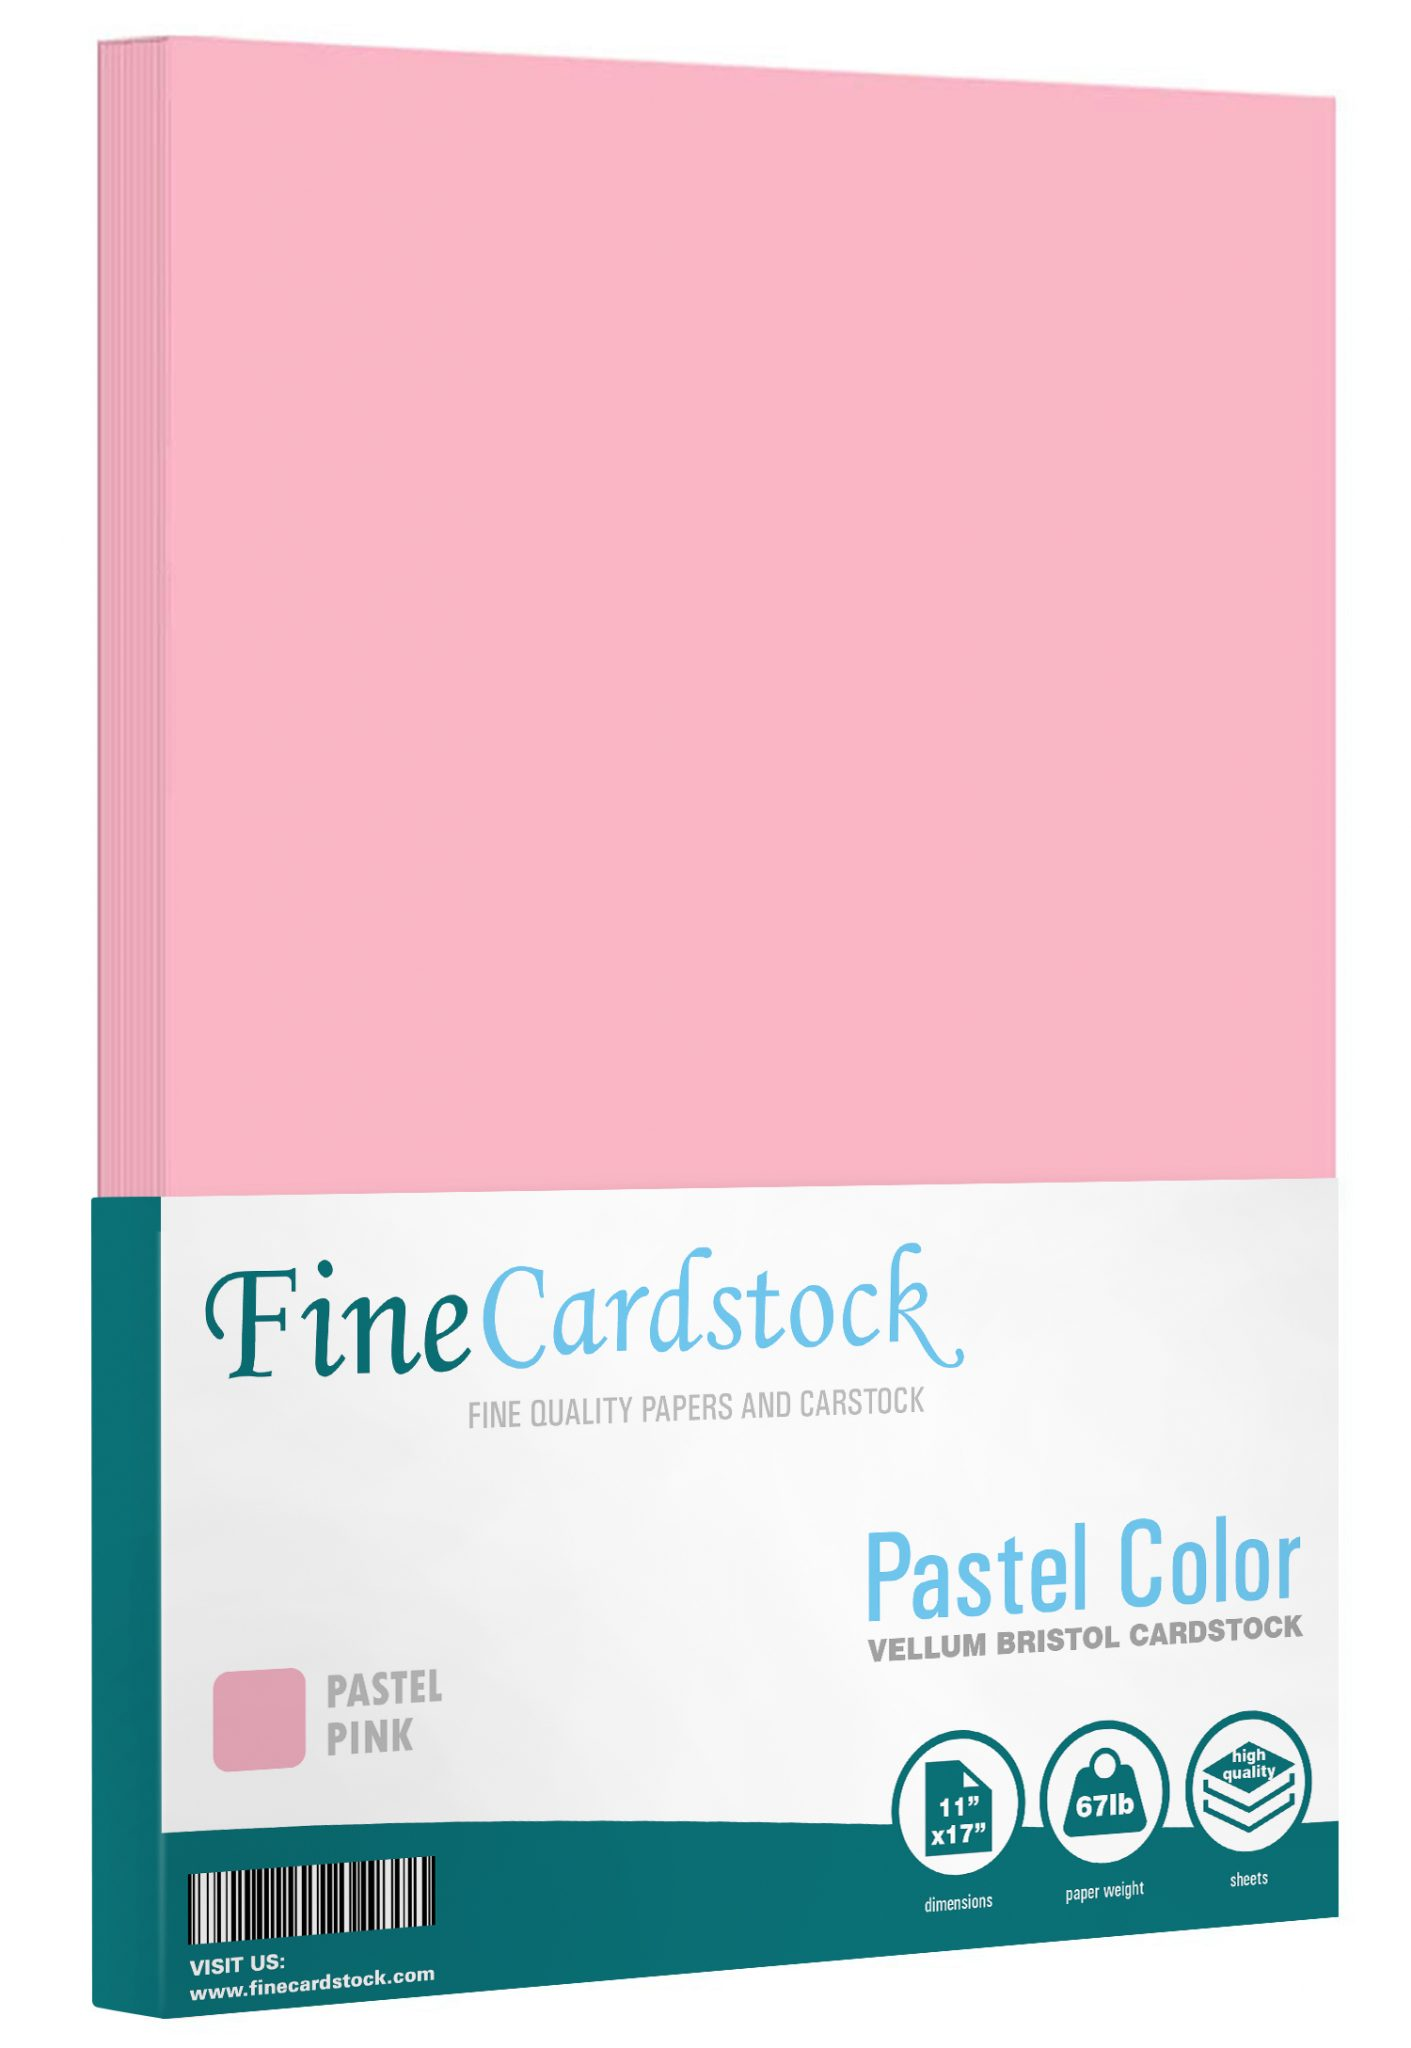 11 x 17 Pastel Cardstock